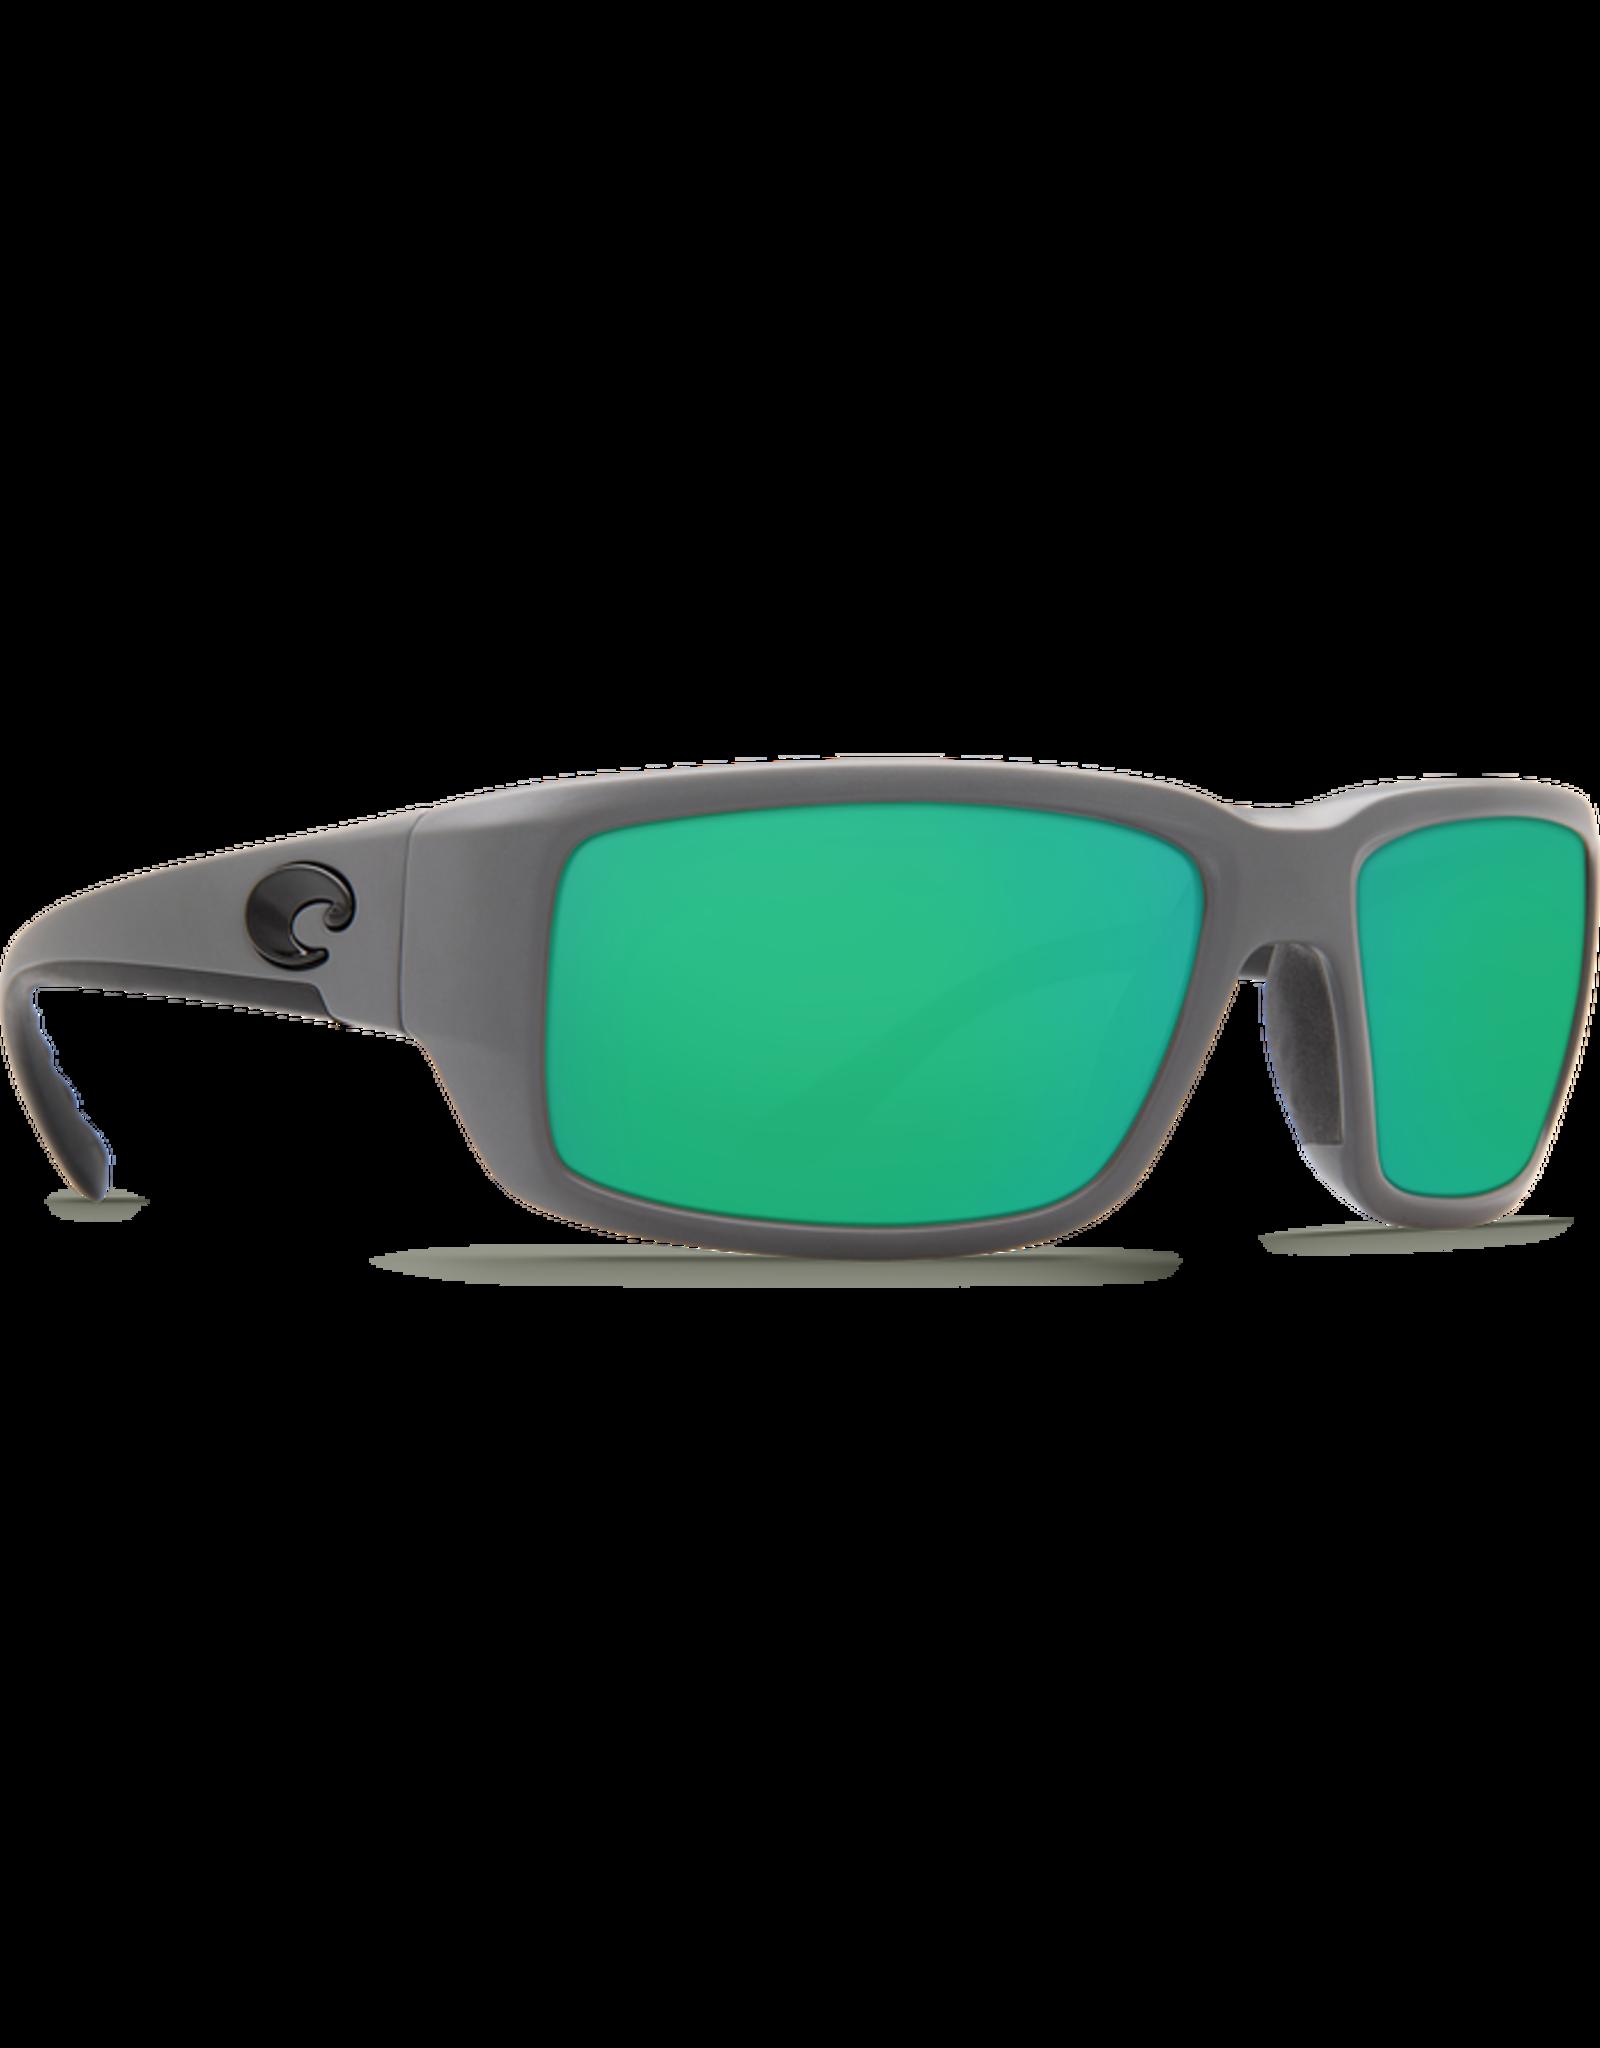 COSTA Fantail Pro- Matte Gray (Green Mirror 580G)